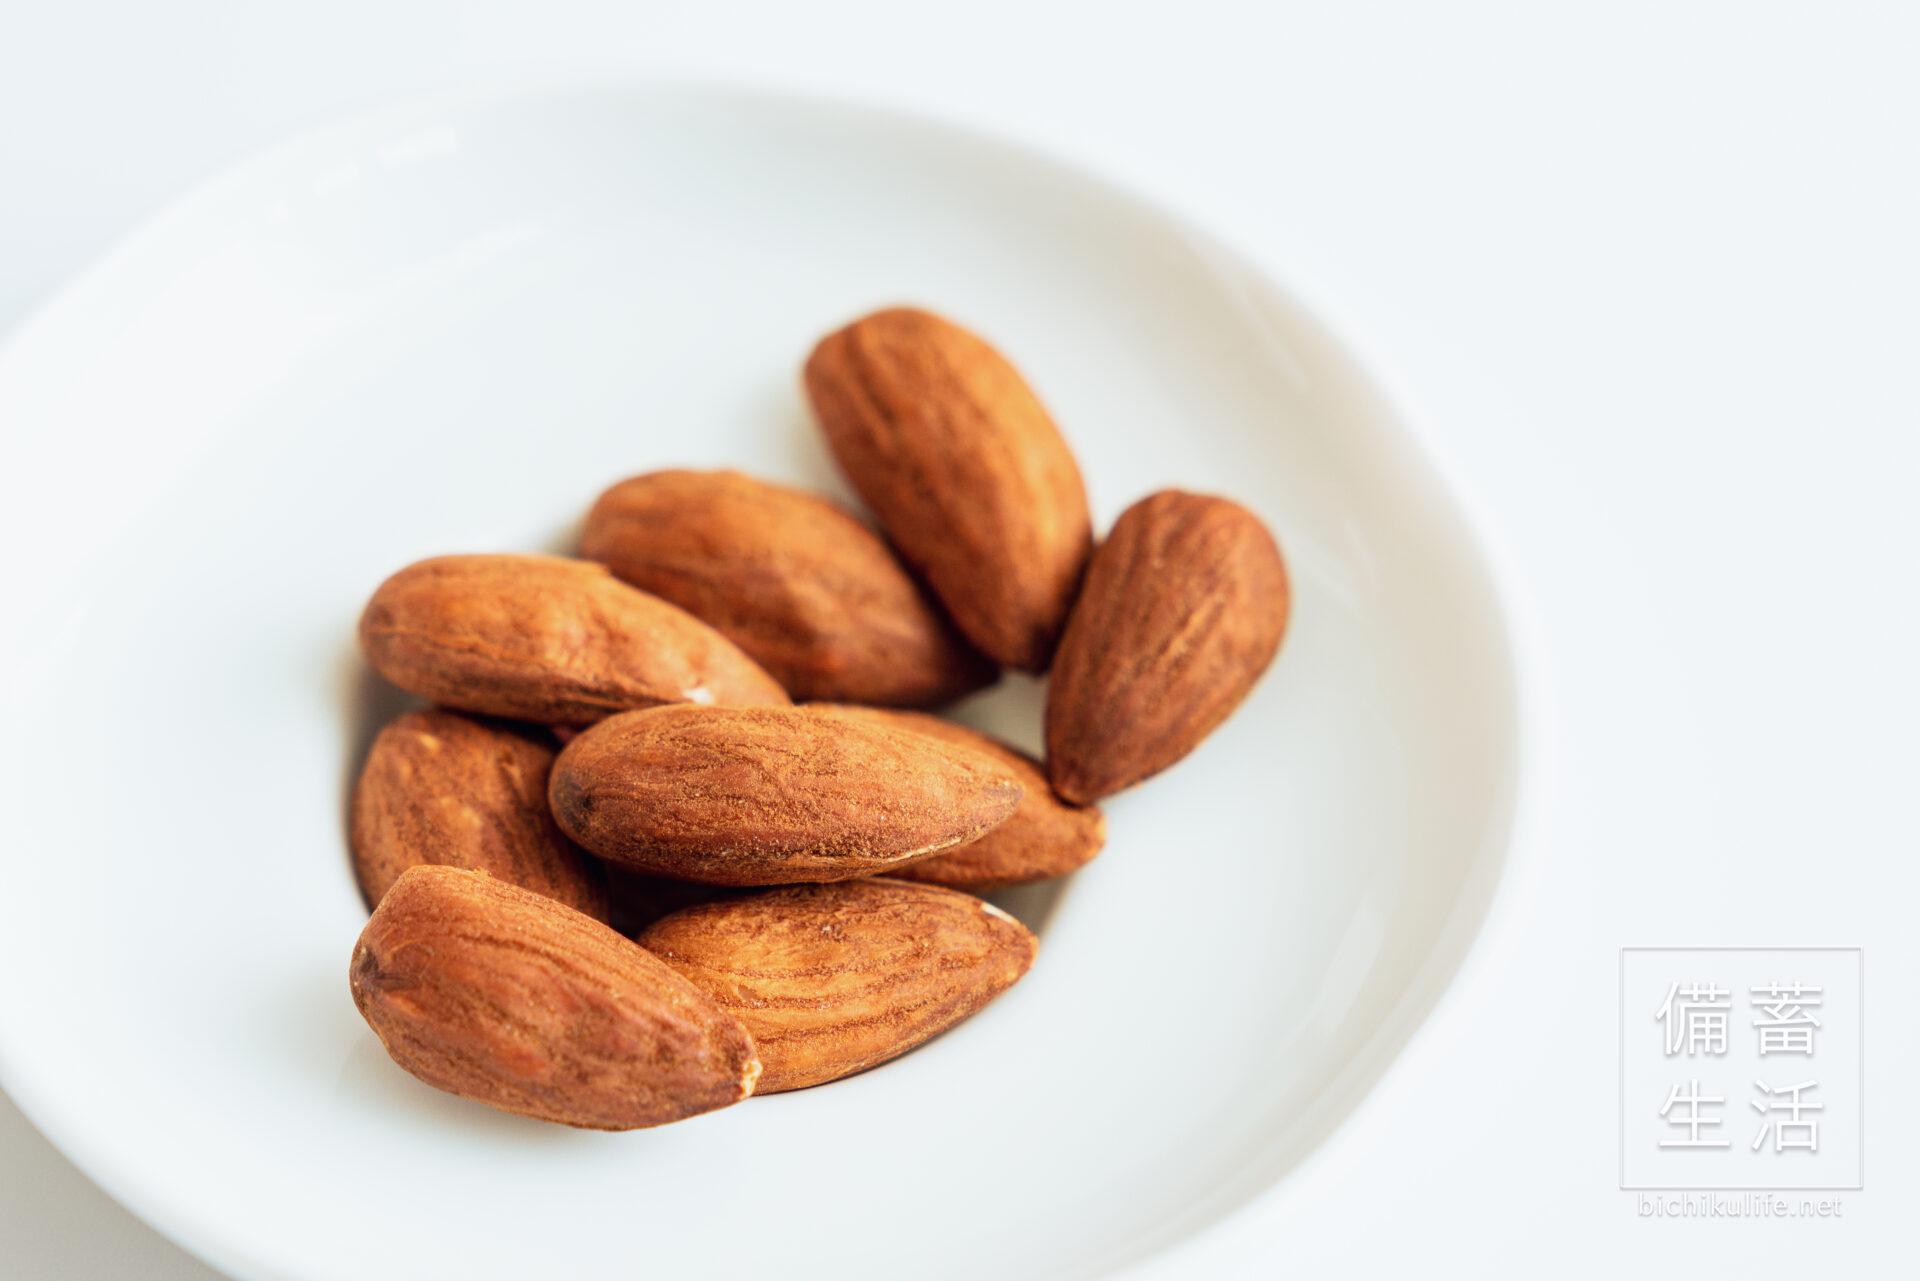 BERGIN Fruit and Nut company 無塩ローストアーモンド